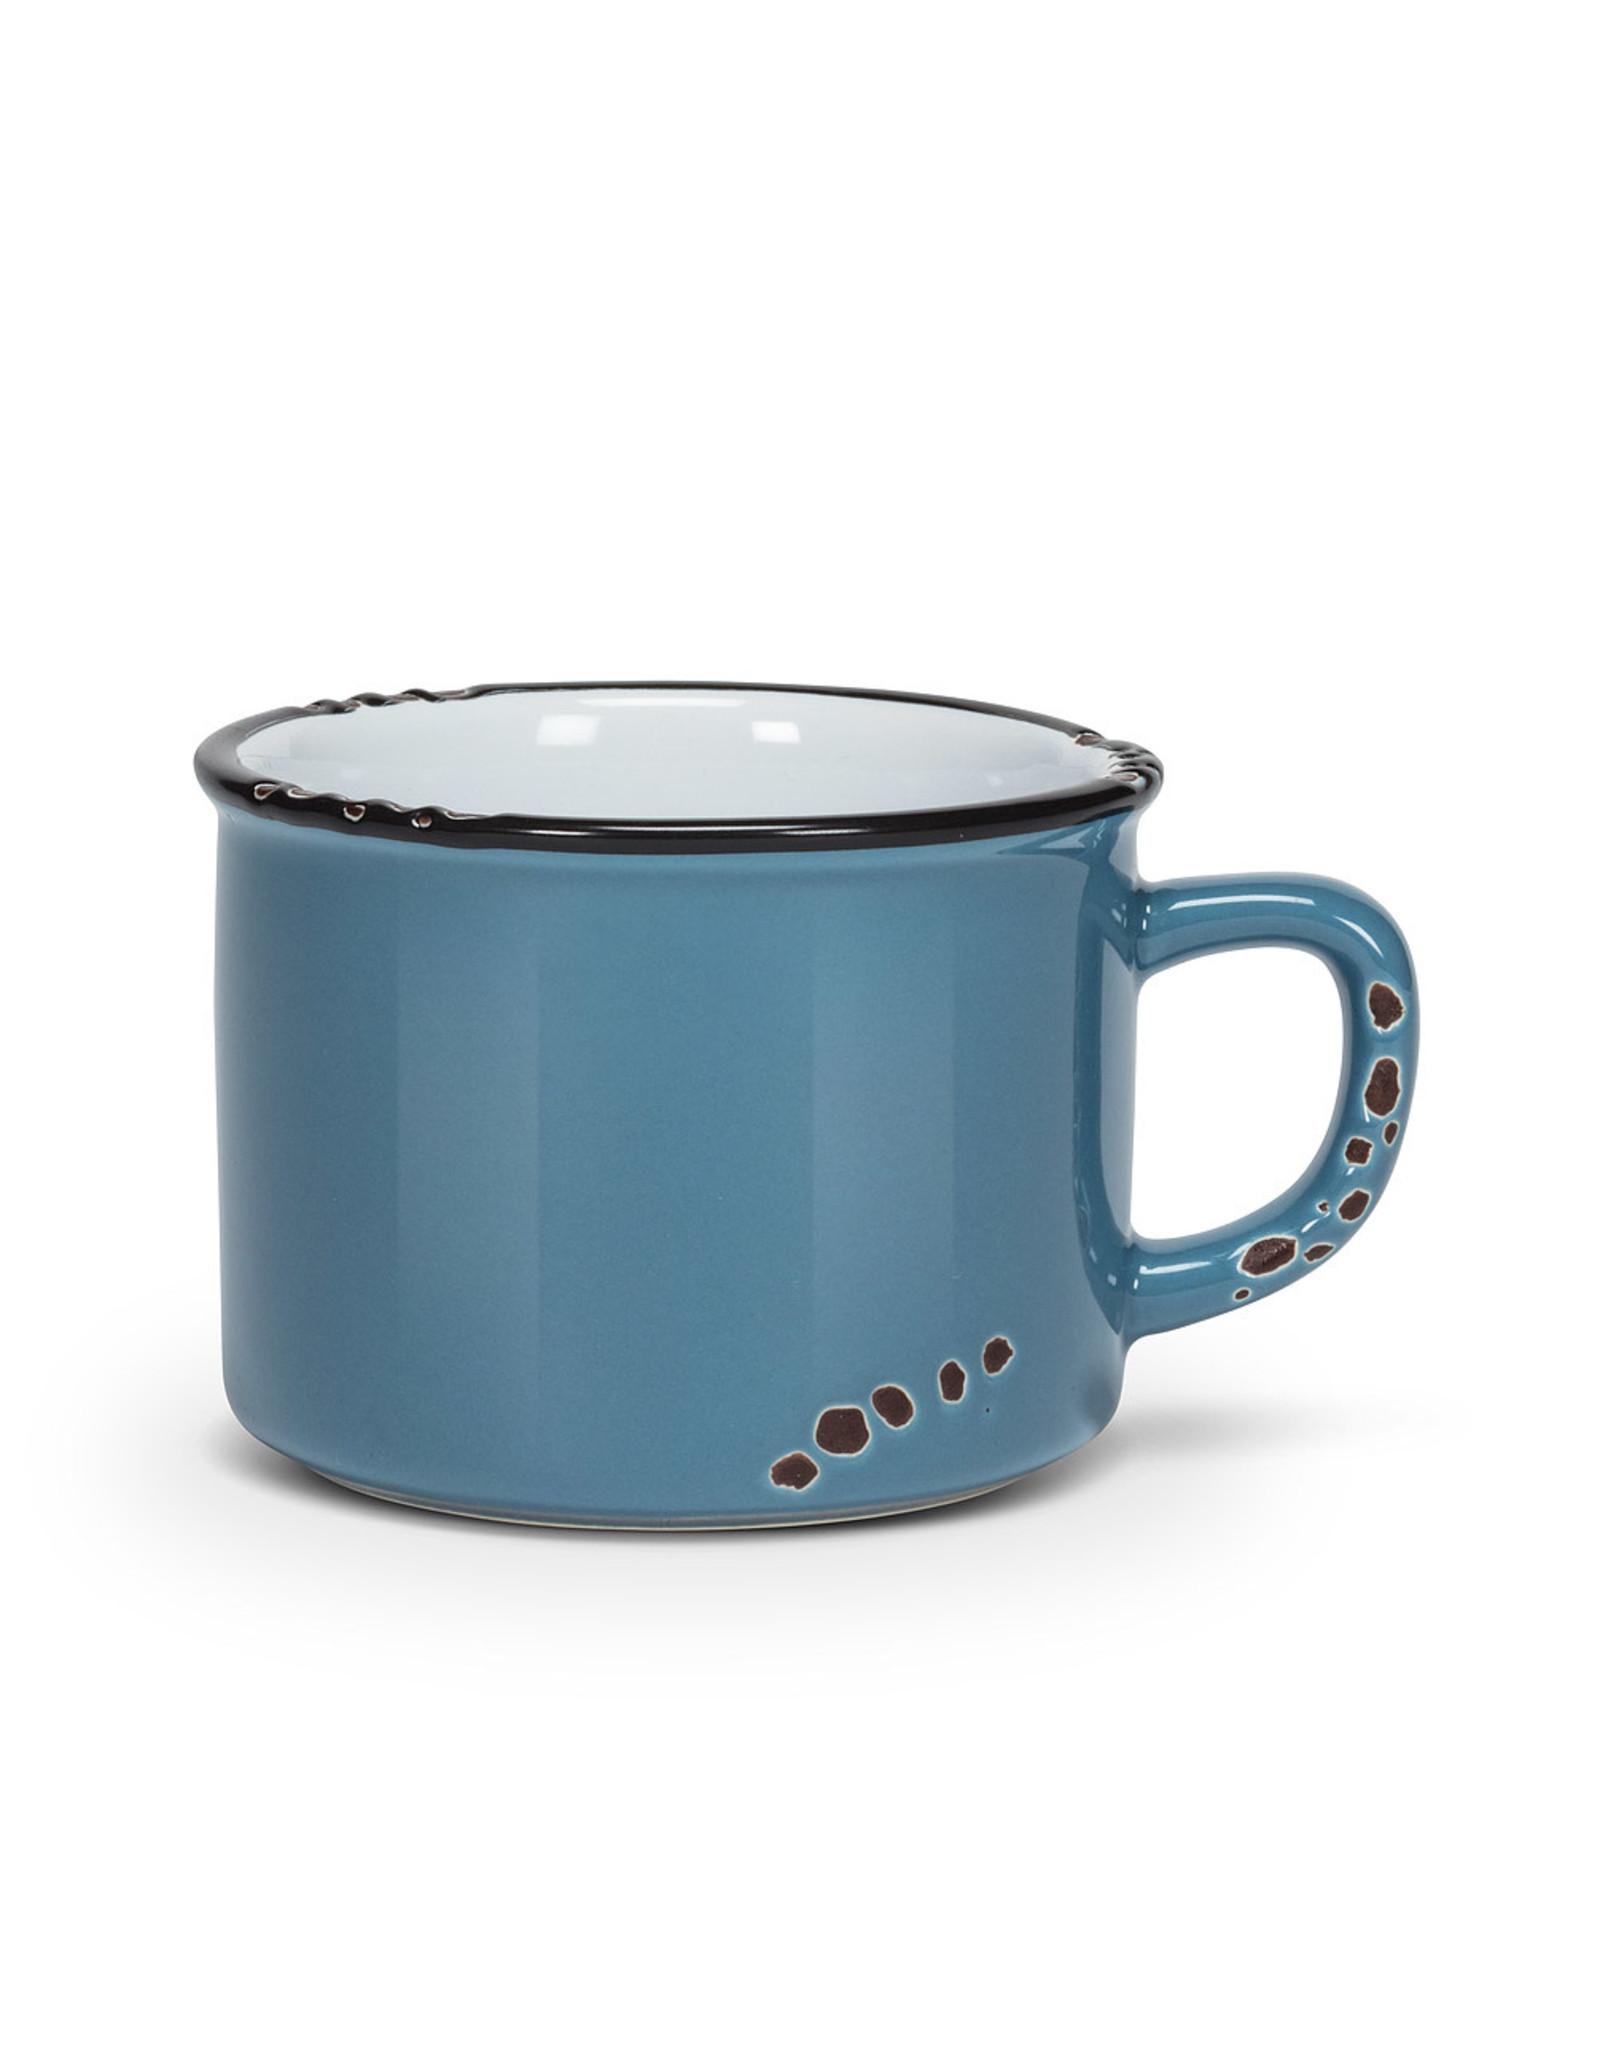 Tasse cappuccino bleue en grès (8 oz)